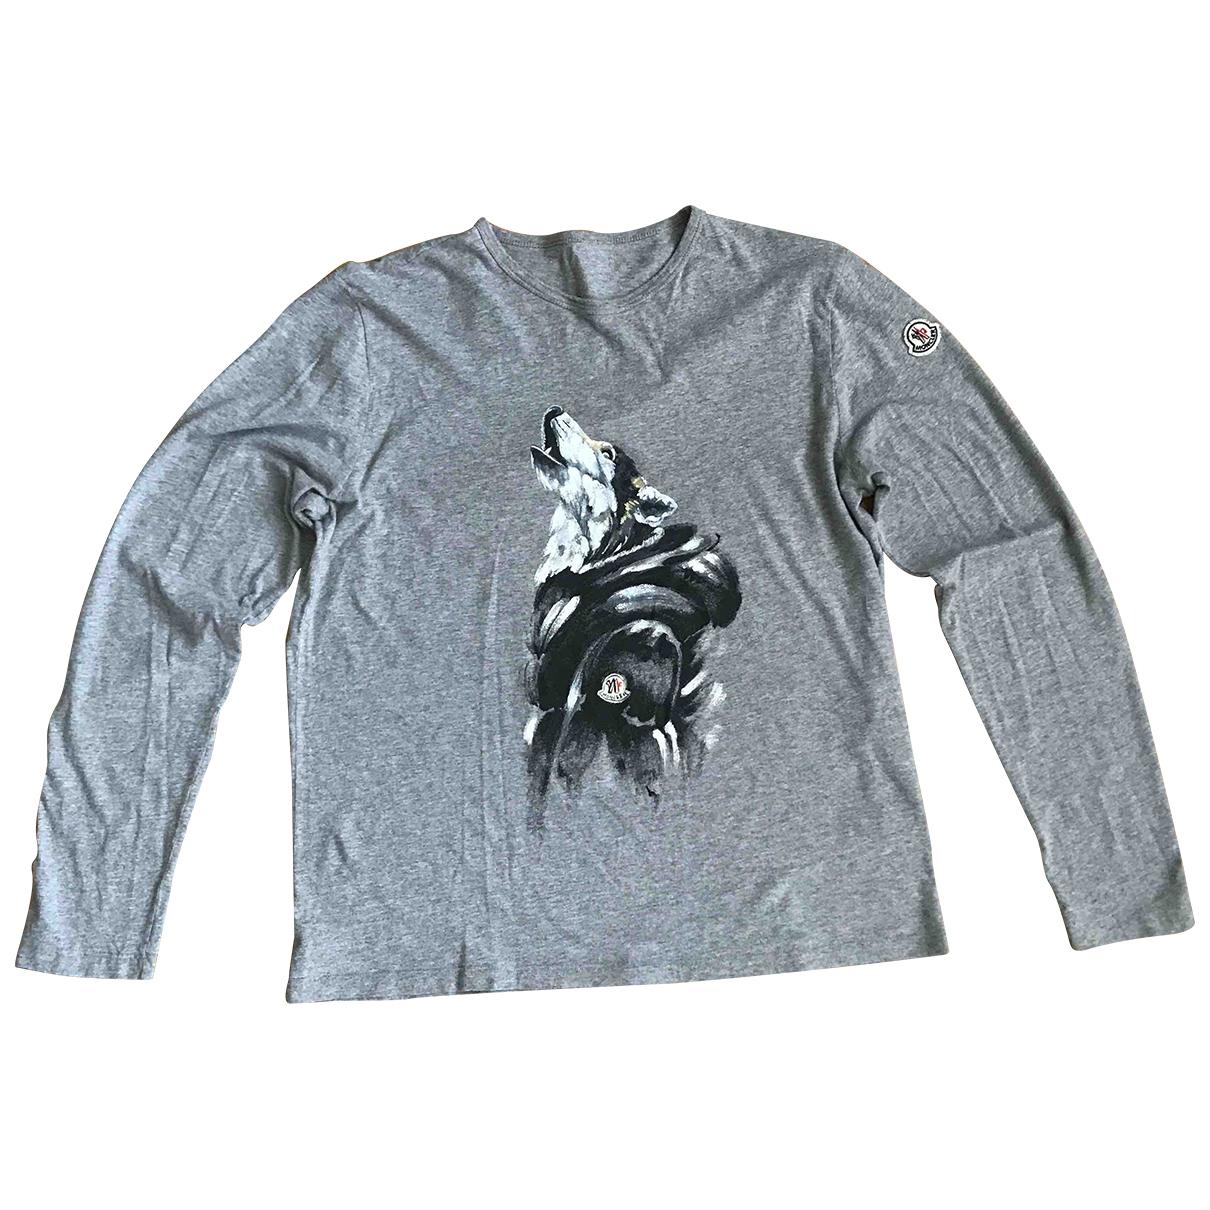 Moncler N Grey Cotton Knitwear & Sweatshirts for Men L International